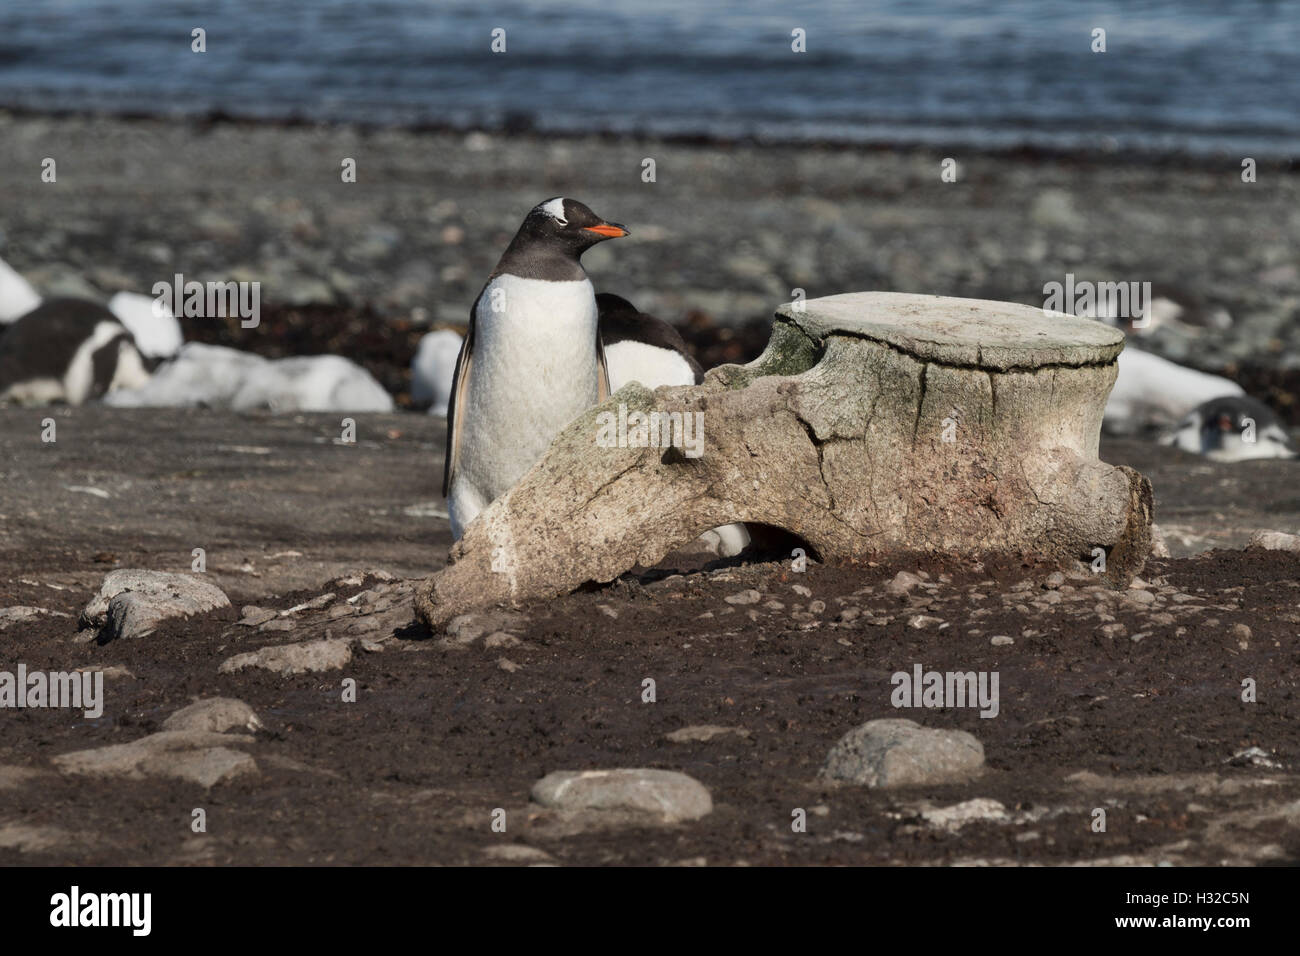 Gentoo Penguin by Whale vertebra - Stock Image